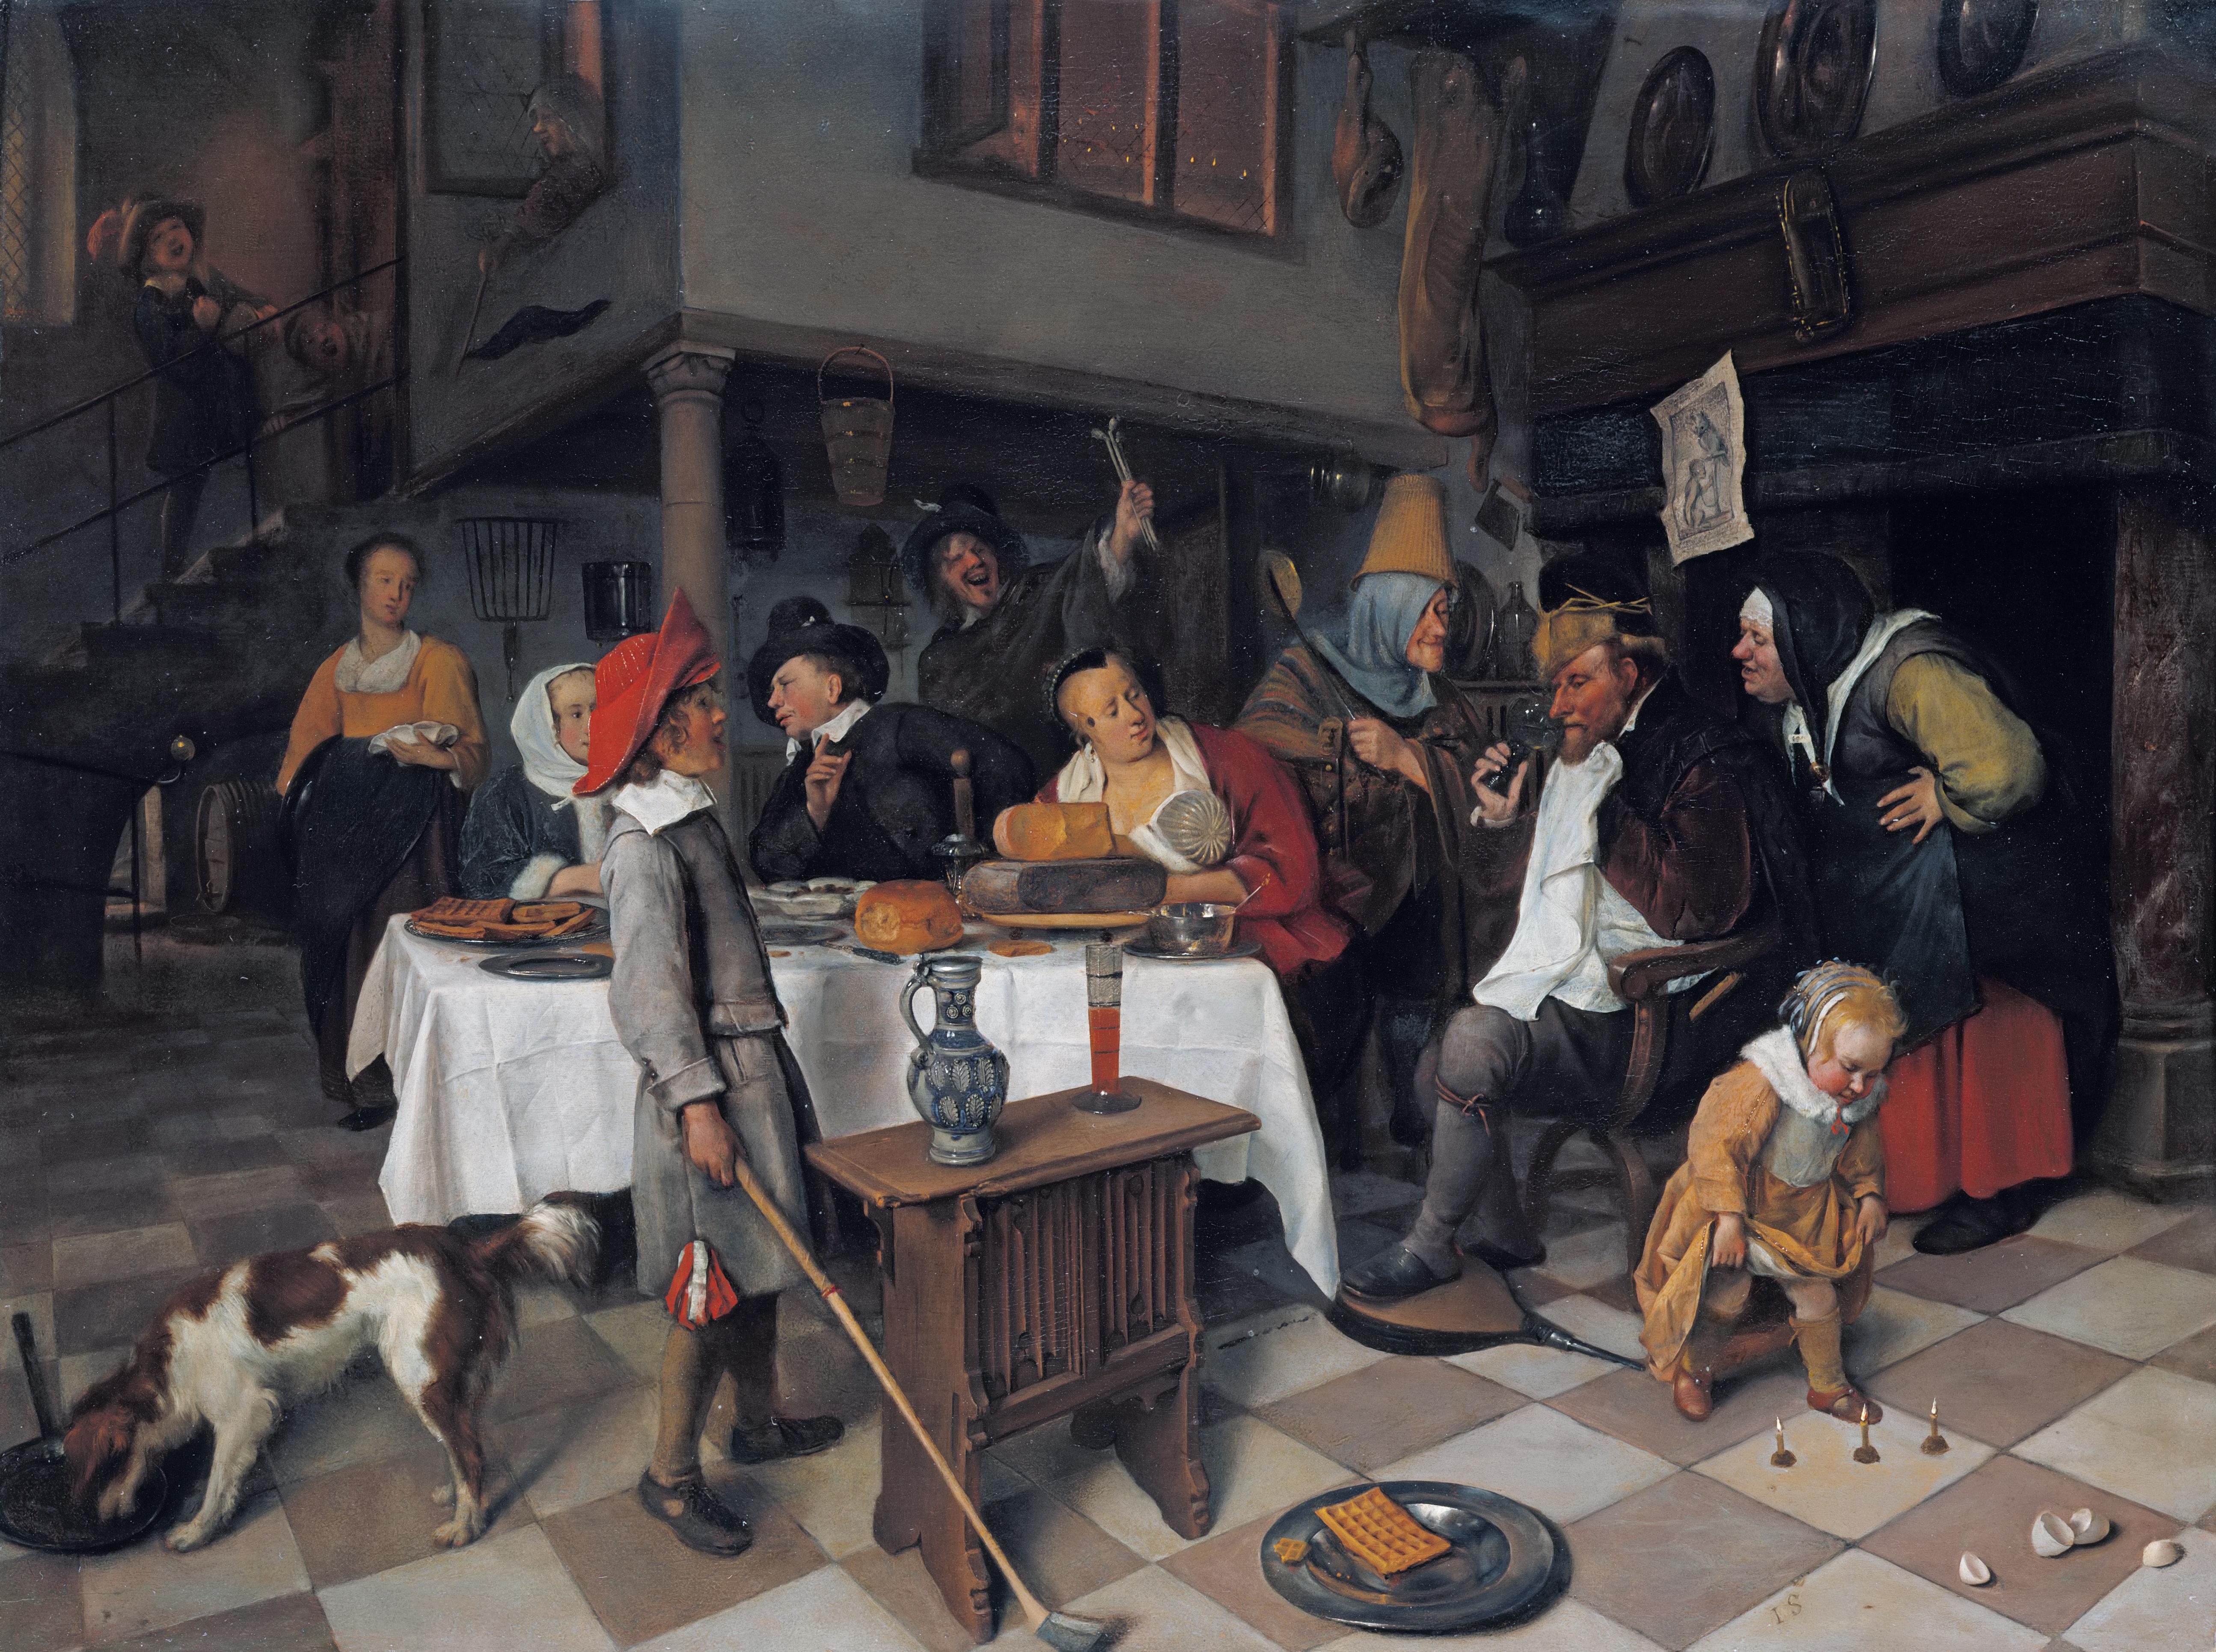 Jan Steen, 'The King Drinks' A Twelfth Night Feast, circa 1661